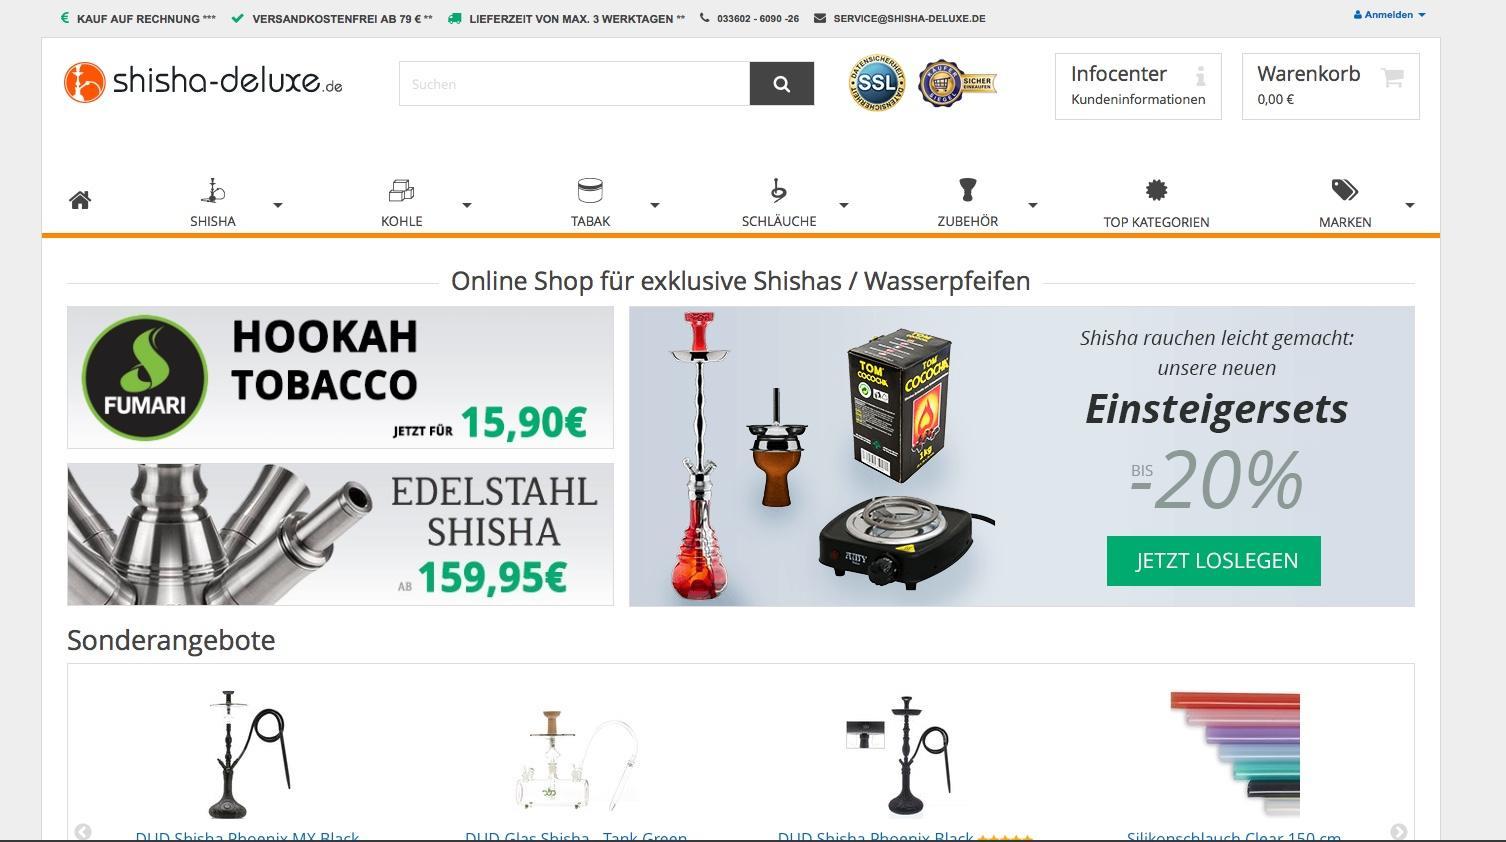 shisha-deluxe gehört zu den Top-50 Spezial-Shops bei ExpertenTesten.de